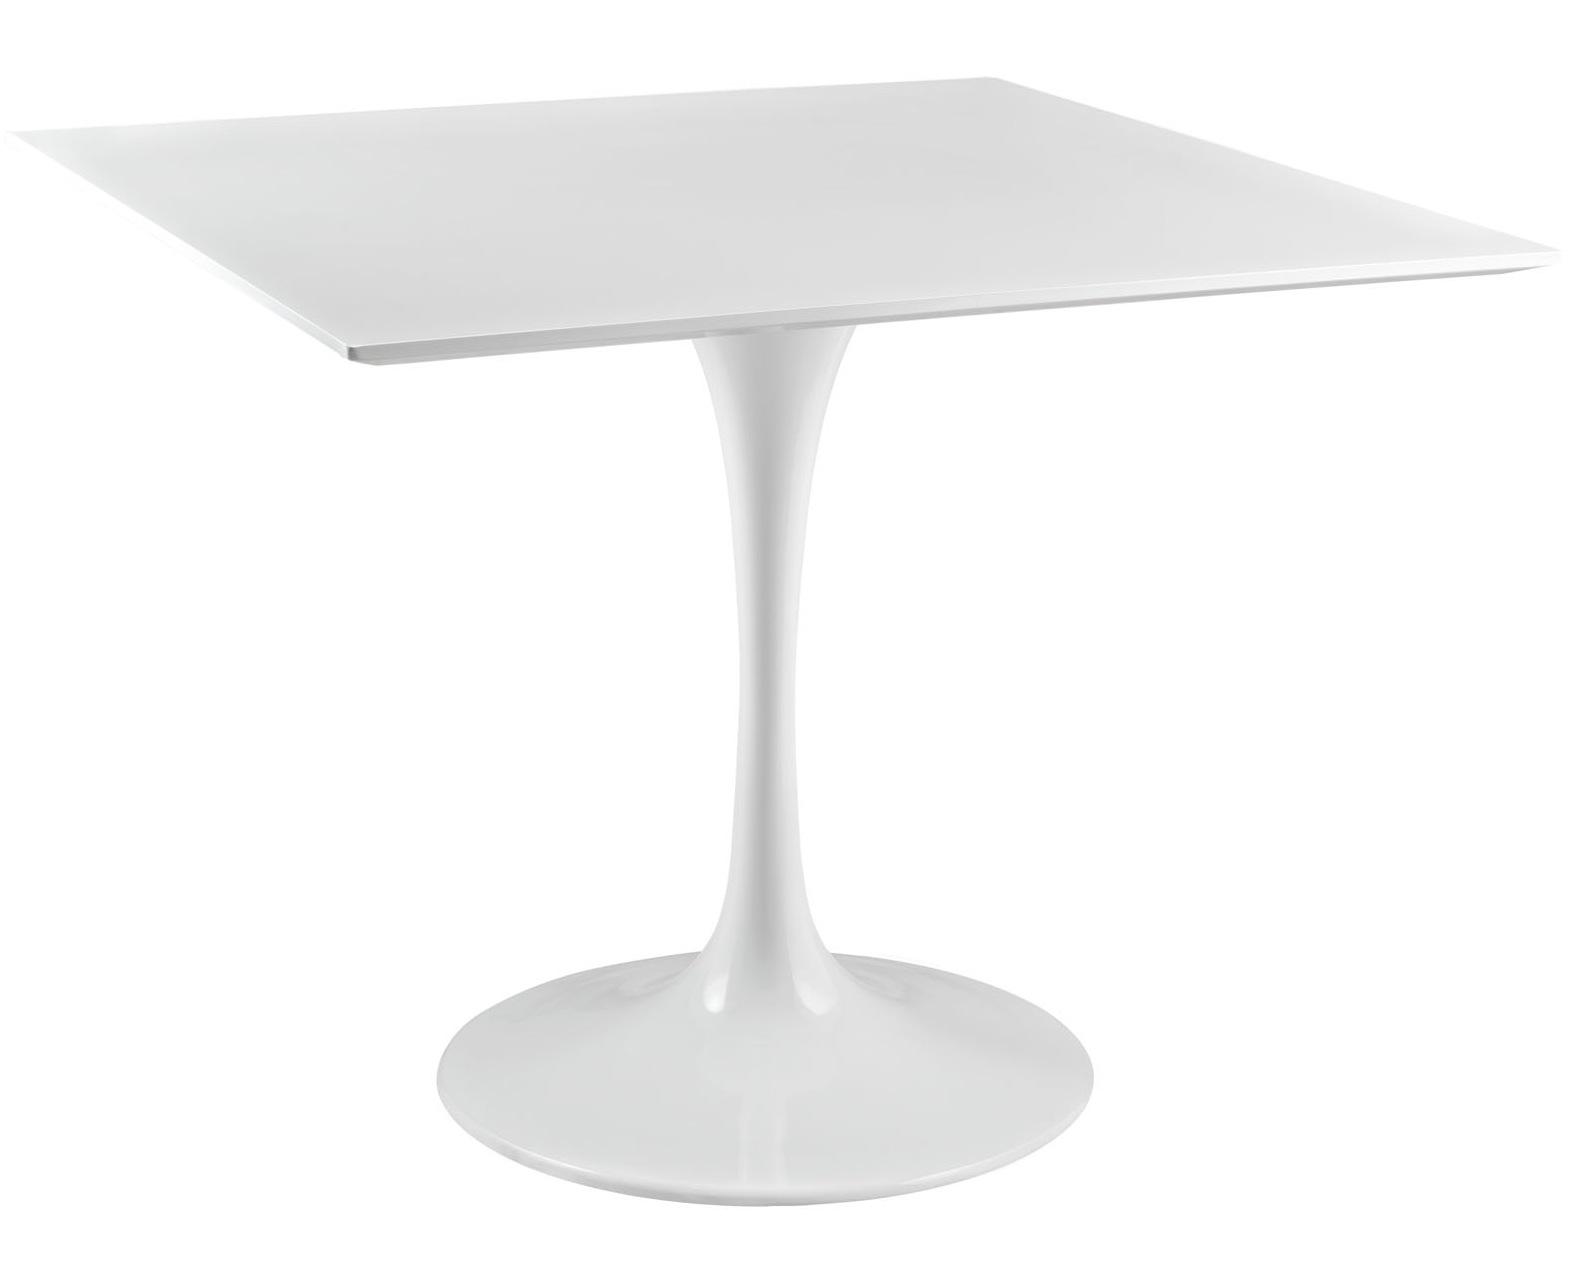 ... 36inch Square Tulip Table